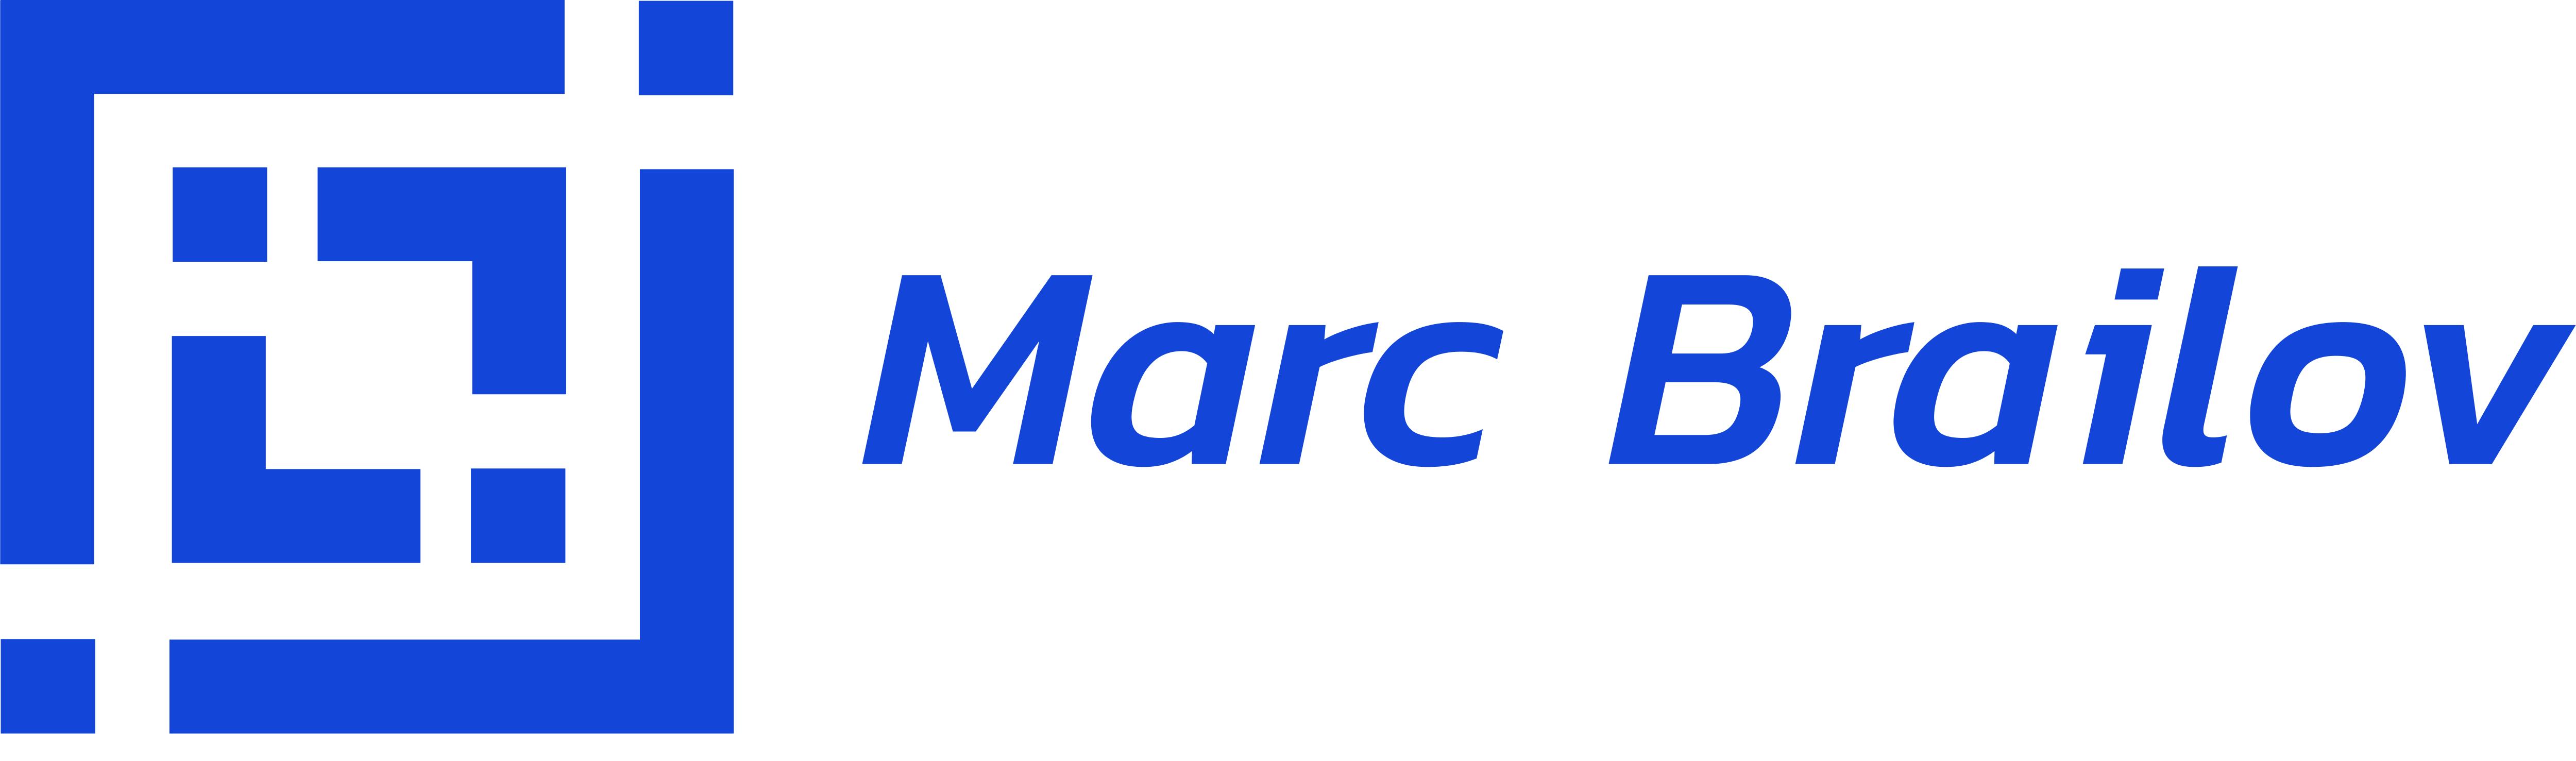 Marc Brailov Global PR Now Offers Full Spectrum PR Training Services